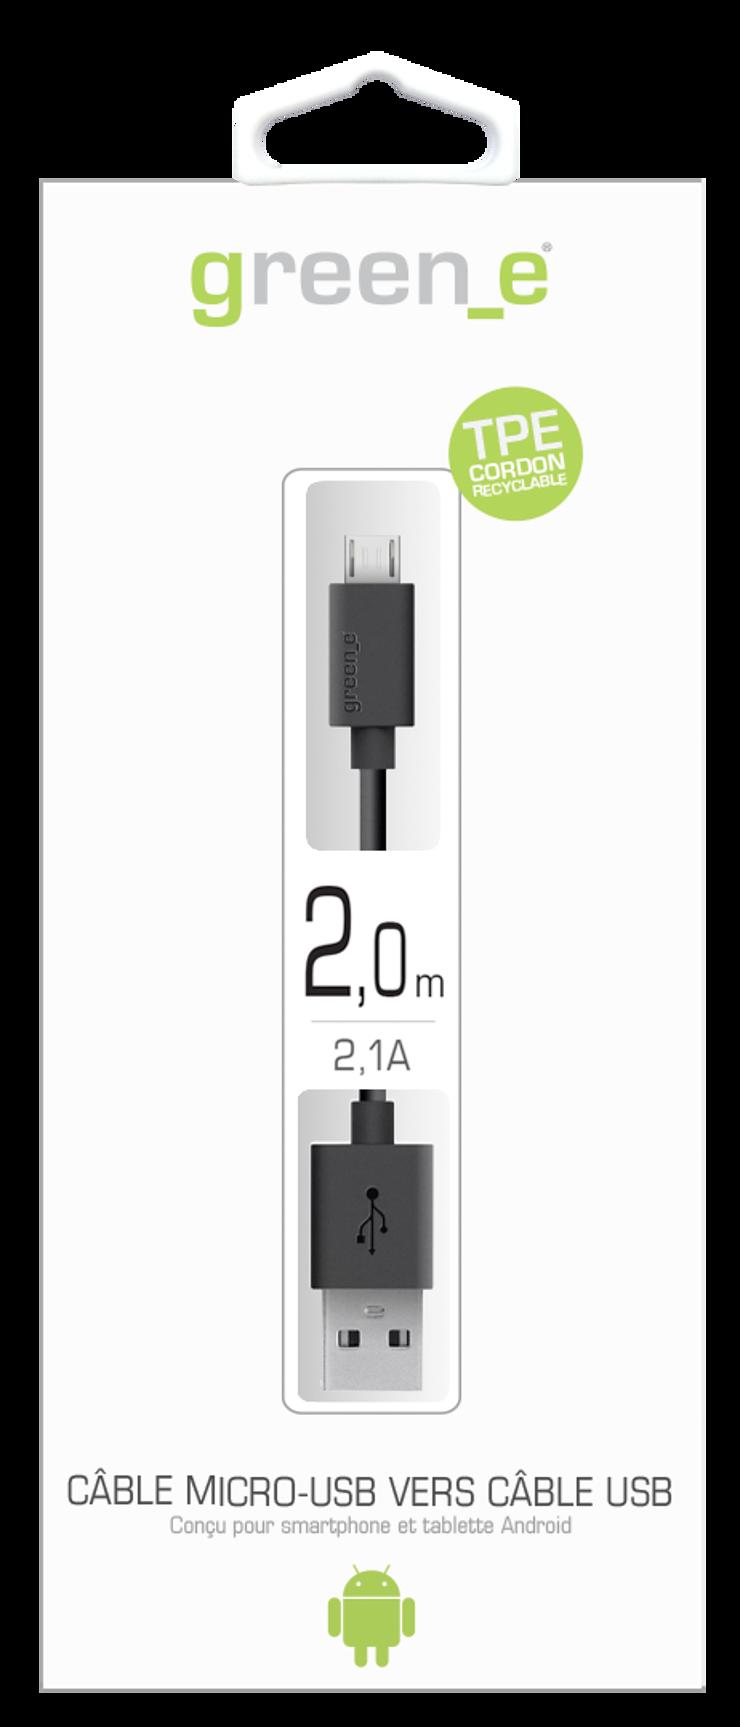 CORDON MICRO USB TPE 2,1A NOIR 2M gr10082-2